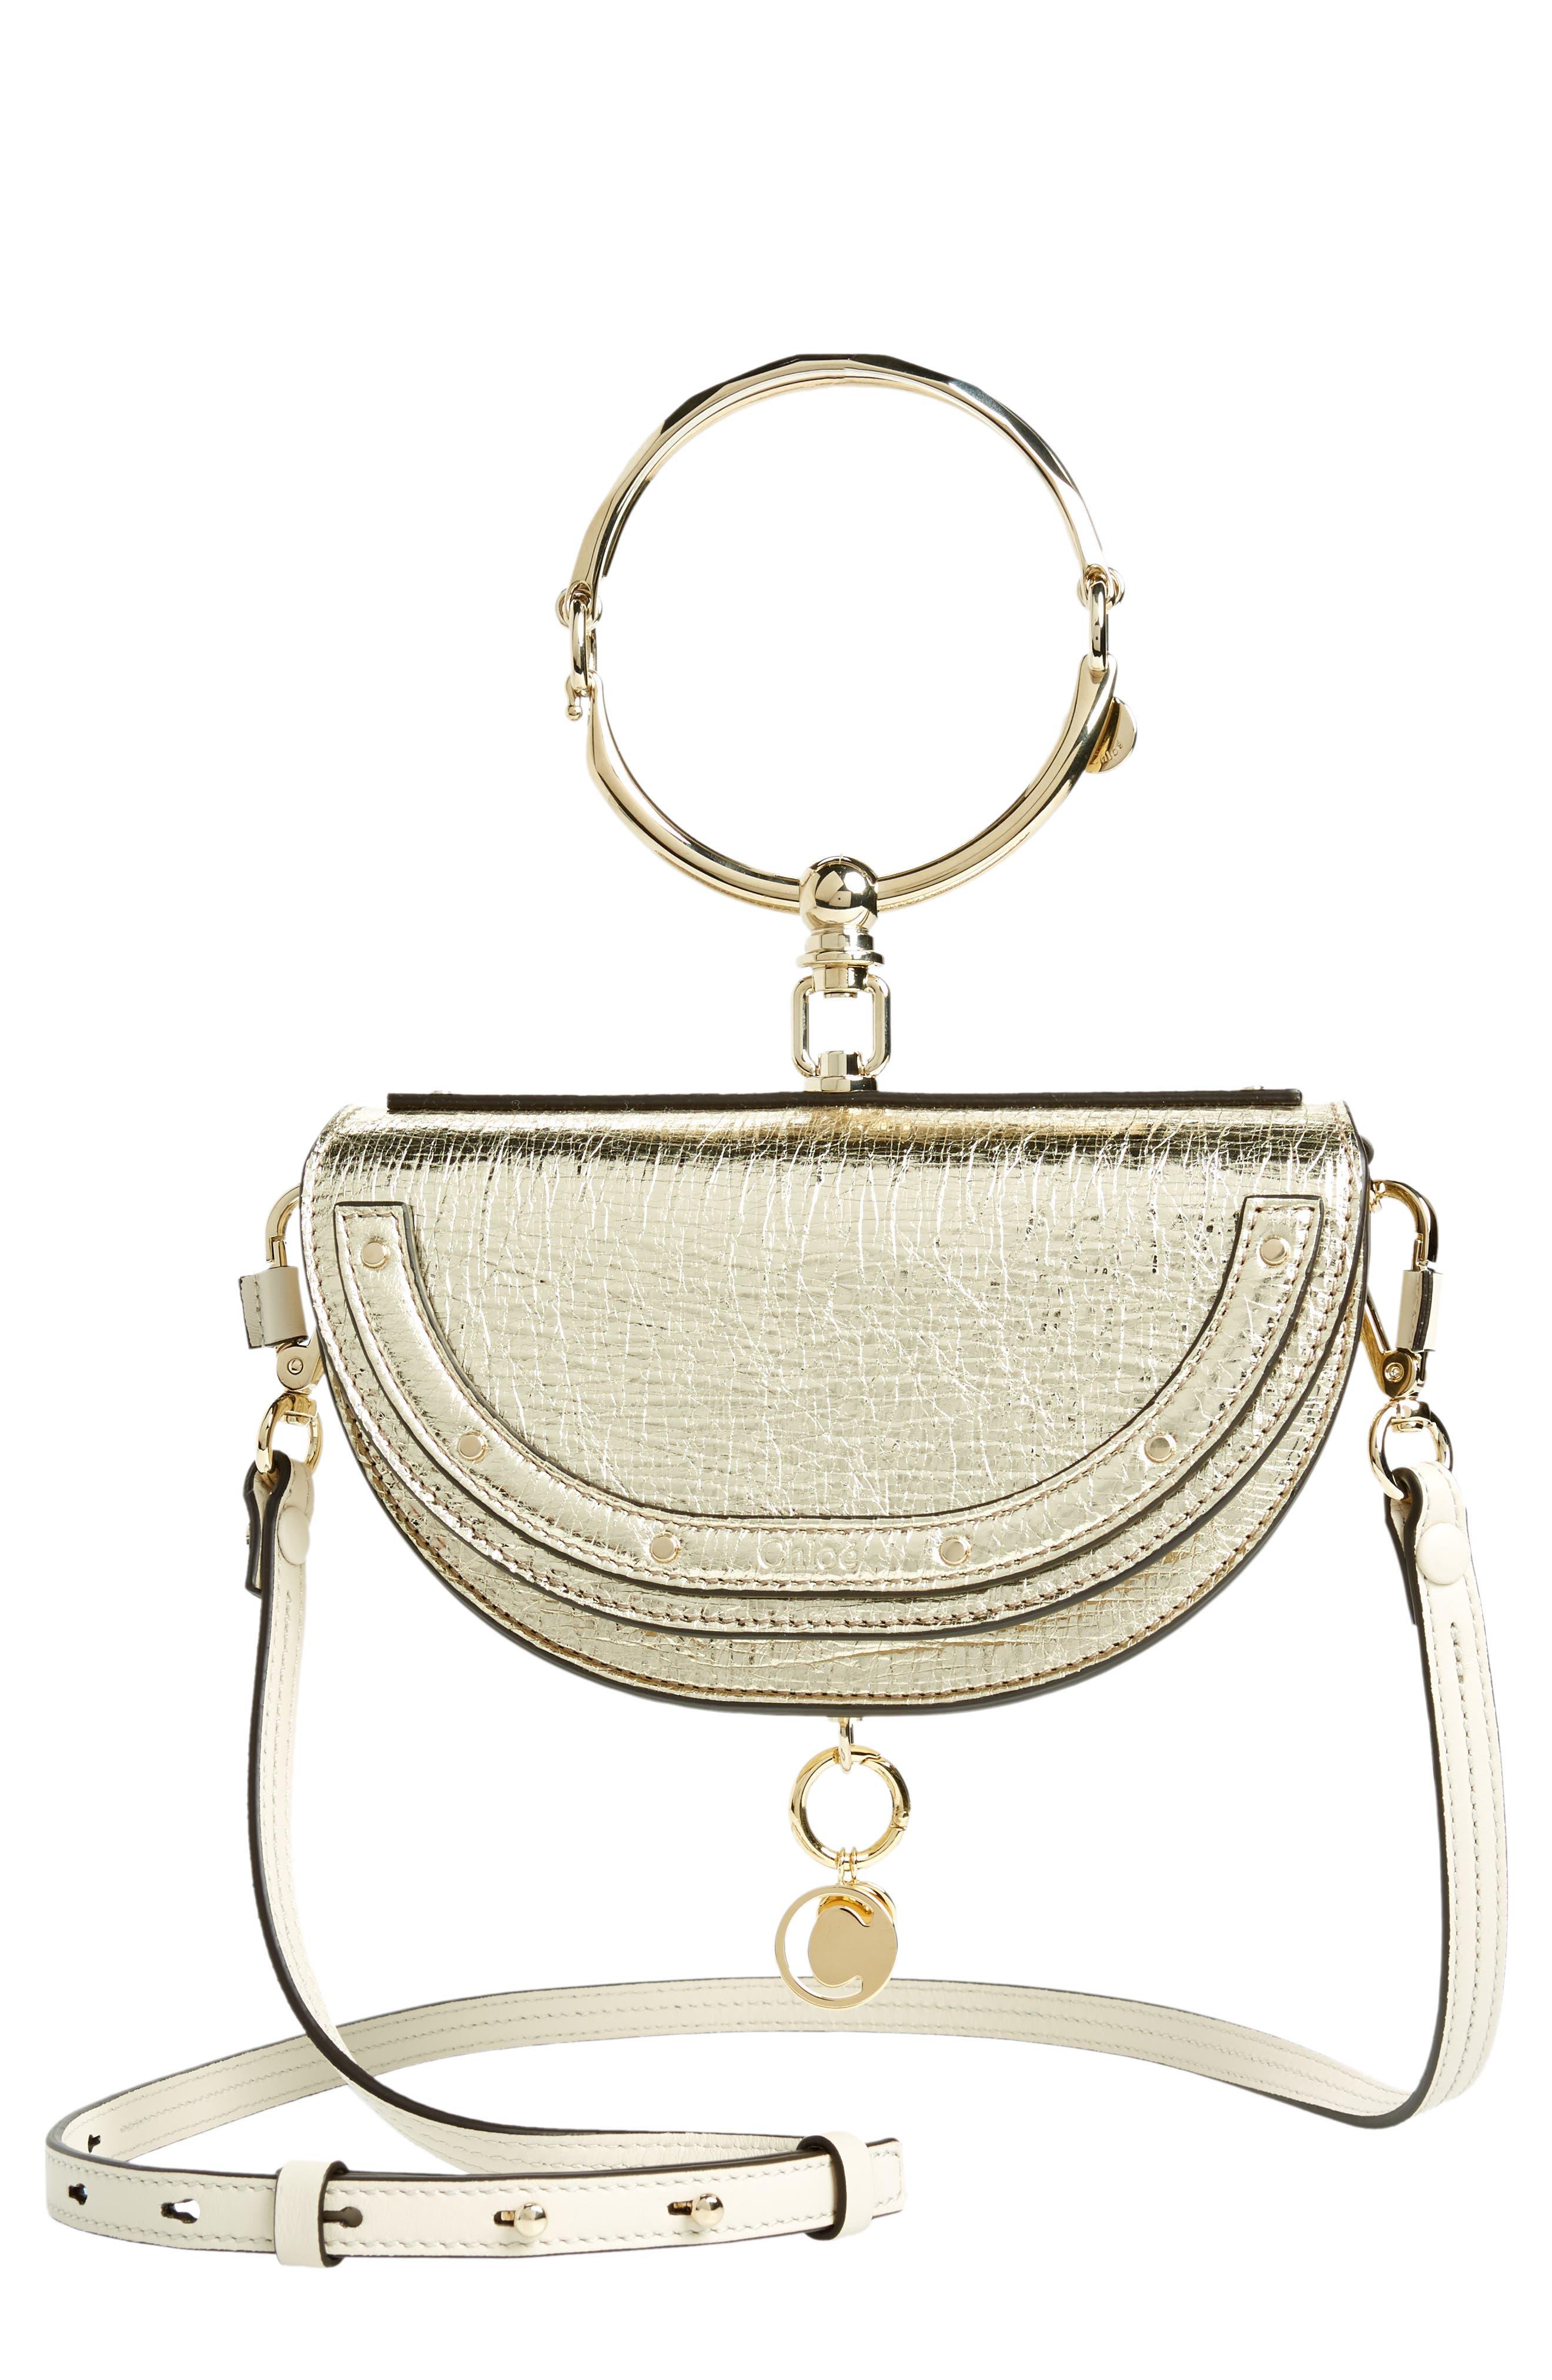 Chloé Small Nile Bracelet Metallic Calfskin Leather Minaudière